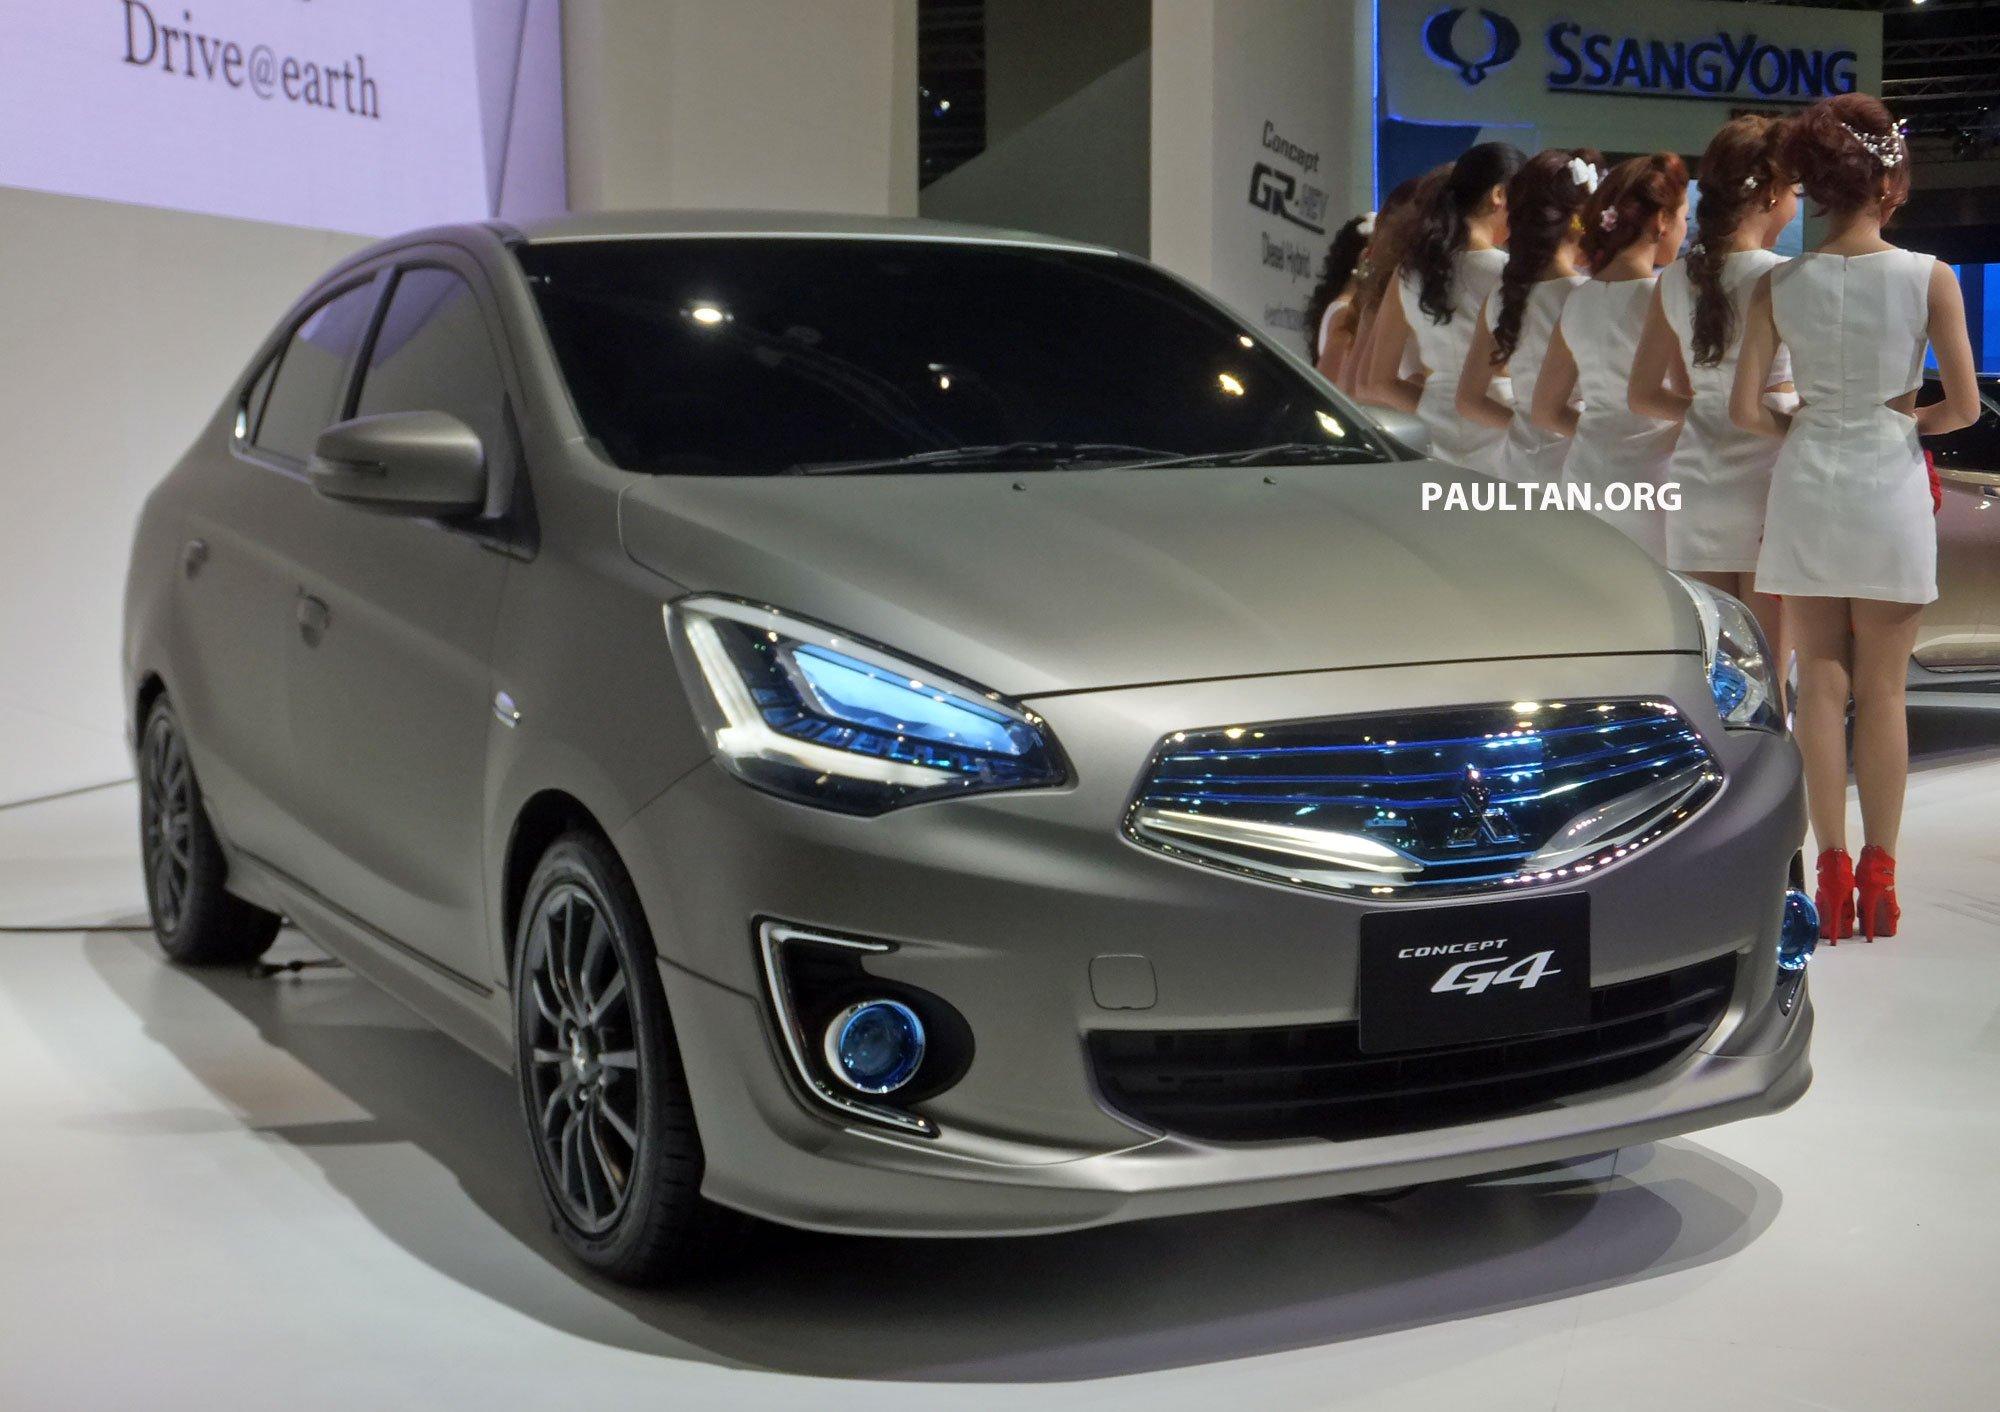 Mitsubishi Concept G4 previews Mirage sedan